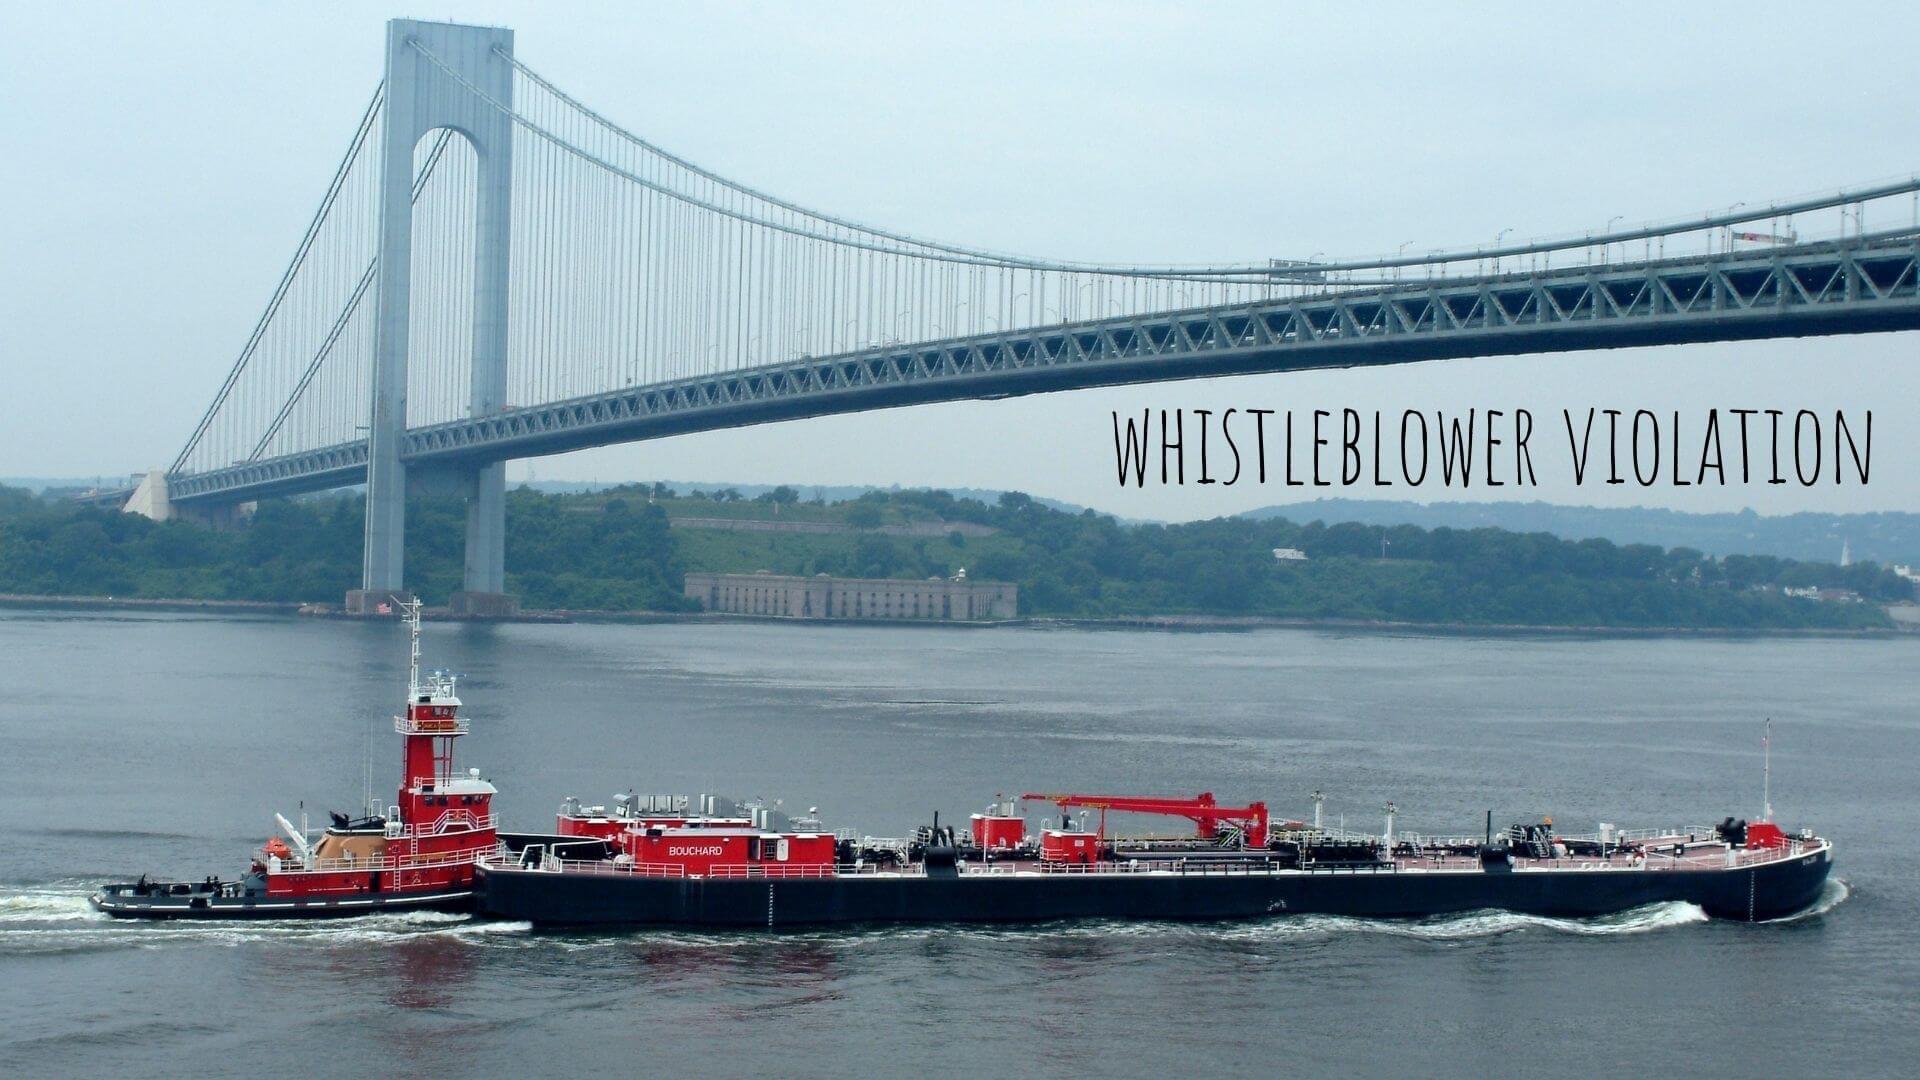 New York Petroleum Carrier Pays $375K